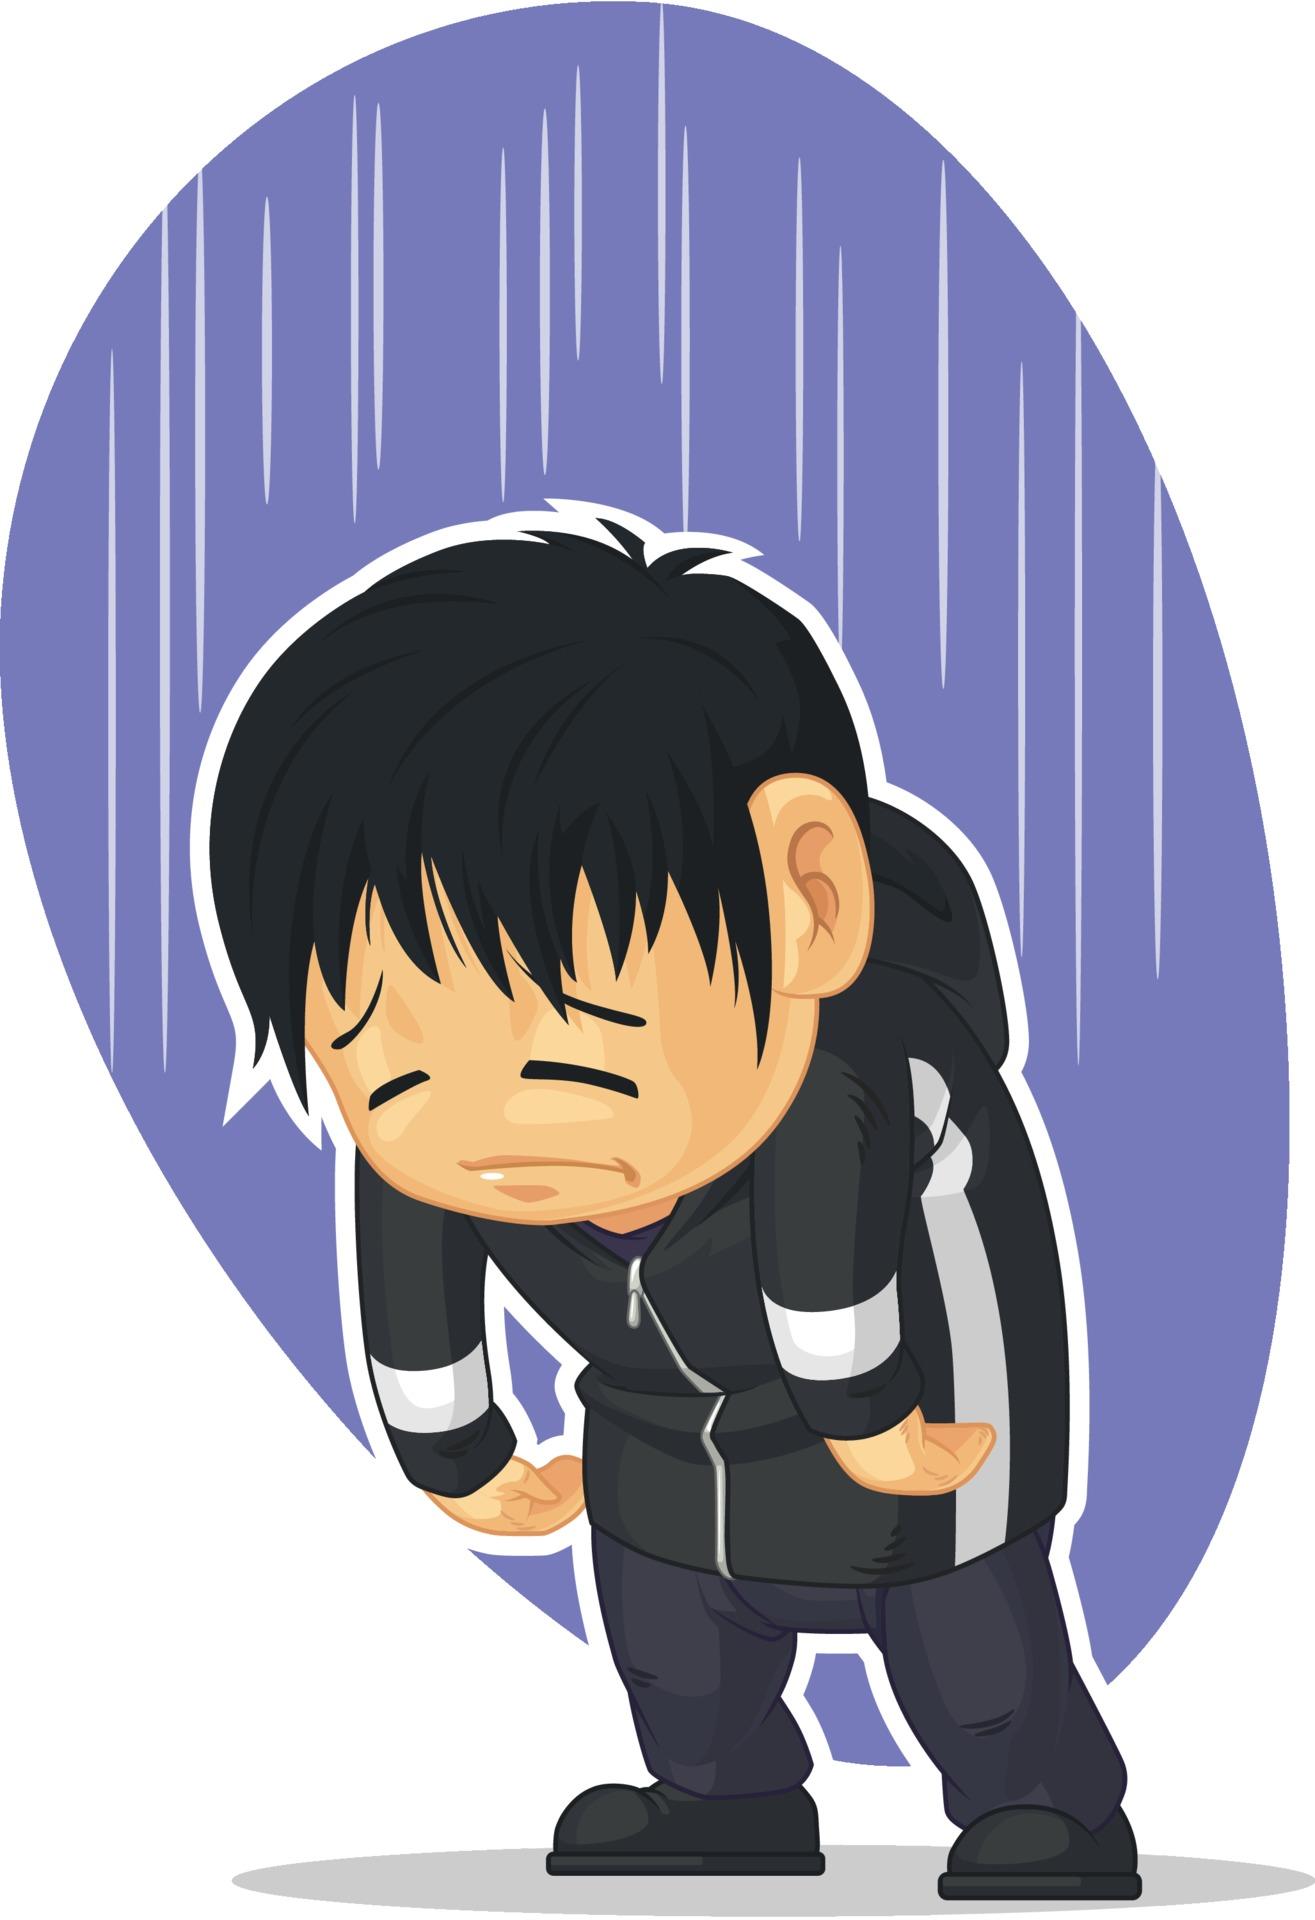 Sad Depressed Boy Griefing Gloomy Mood Unhappy Feelings Cartoon 2144077 Vector Art At Vecteezy